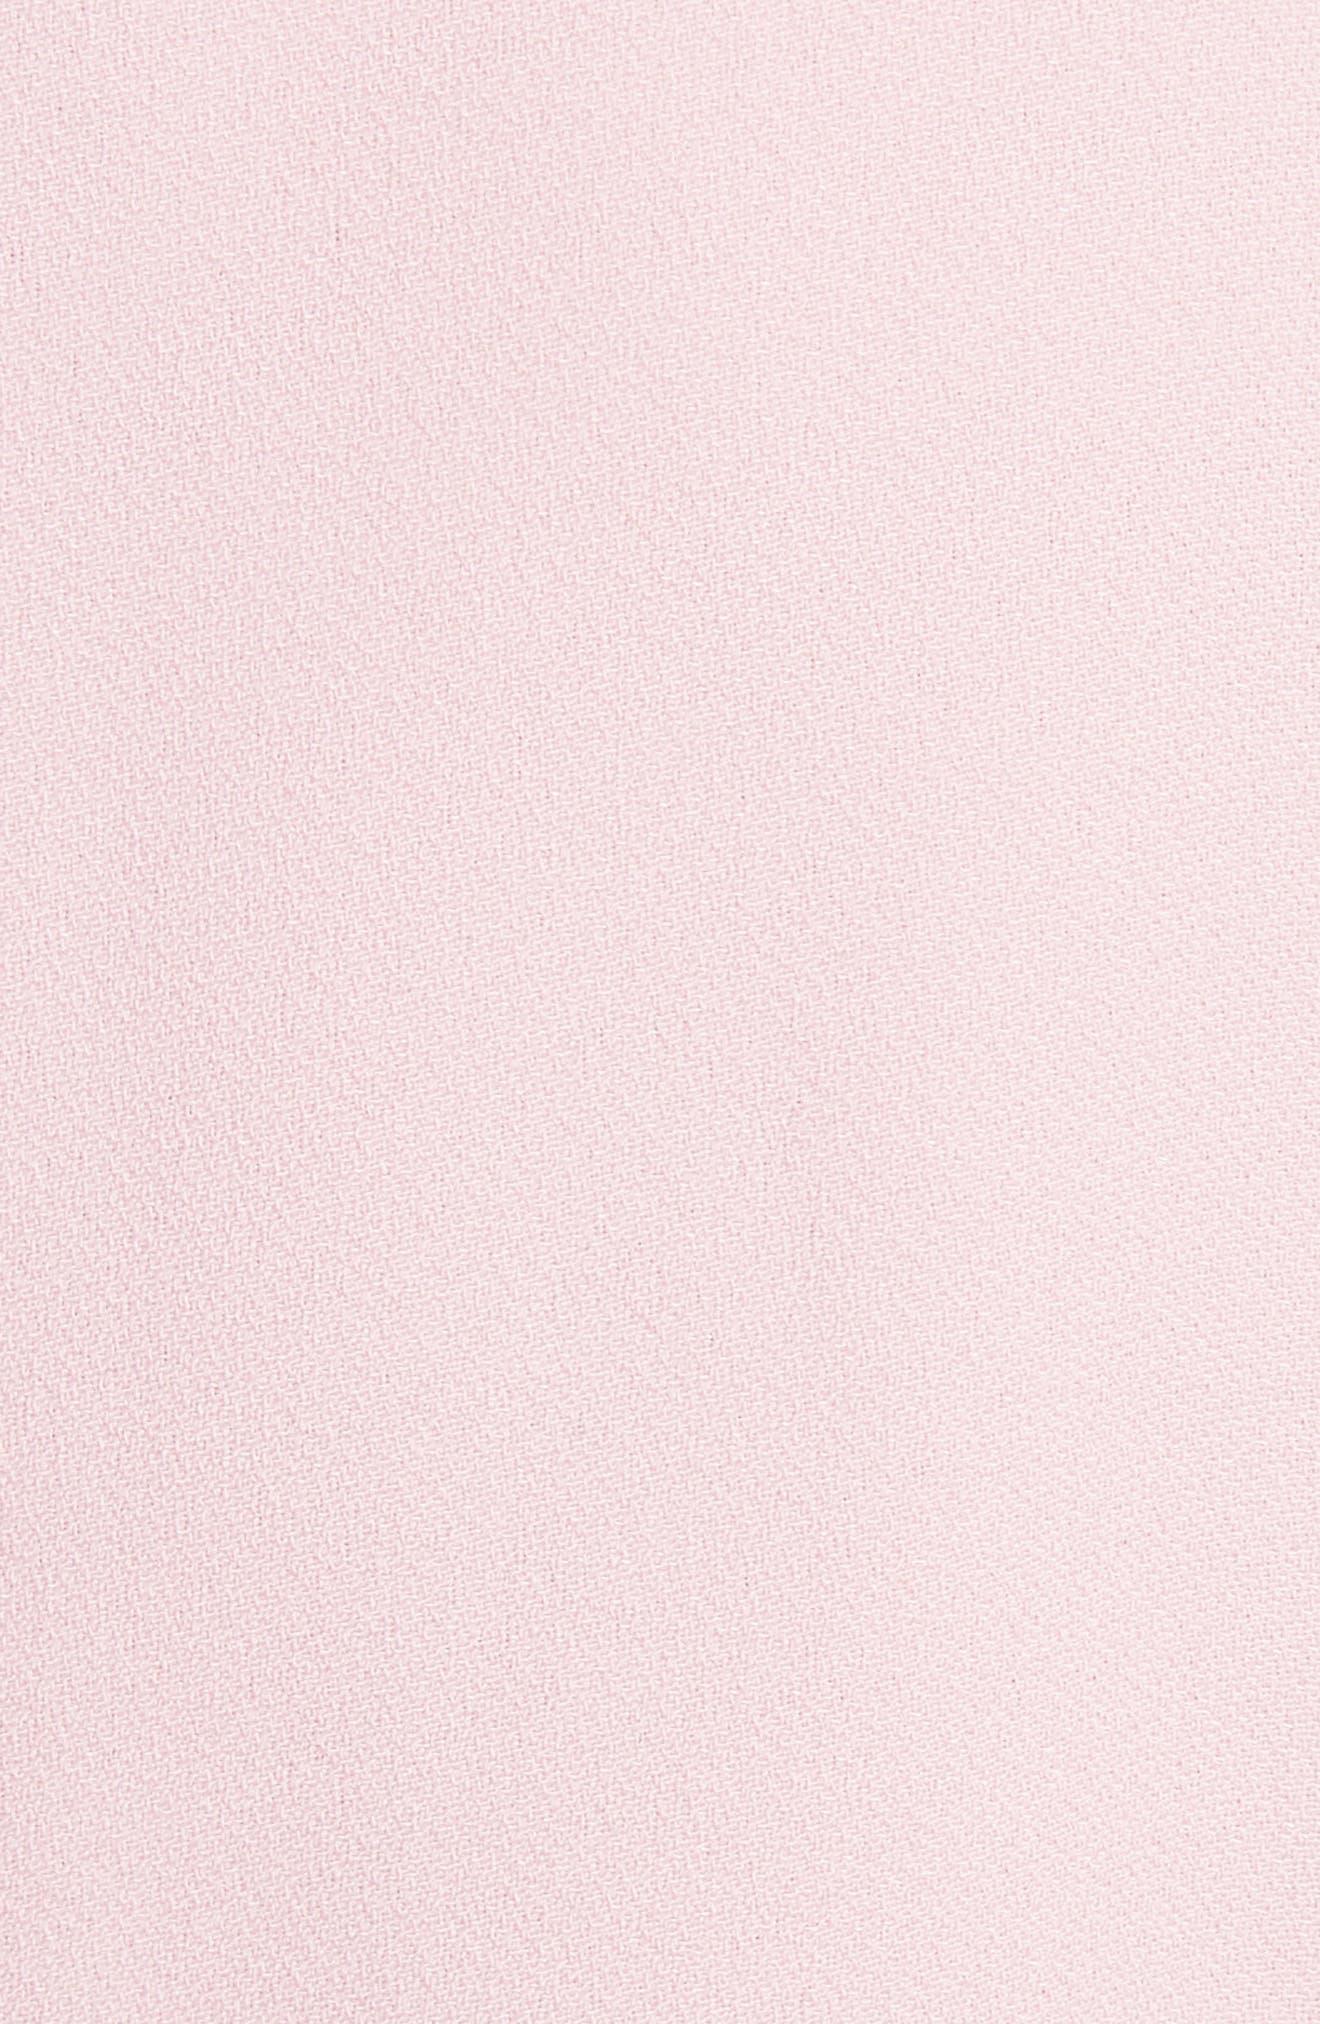 Steyla Ruffle Dress,                             Alternate thumbnail 5, color,                             652